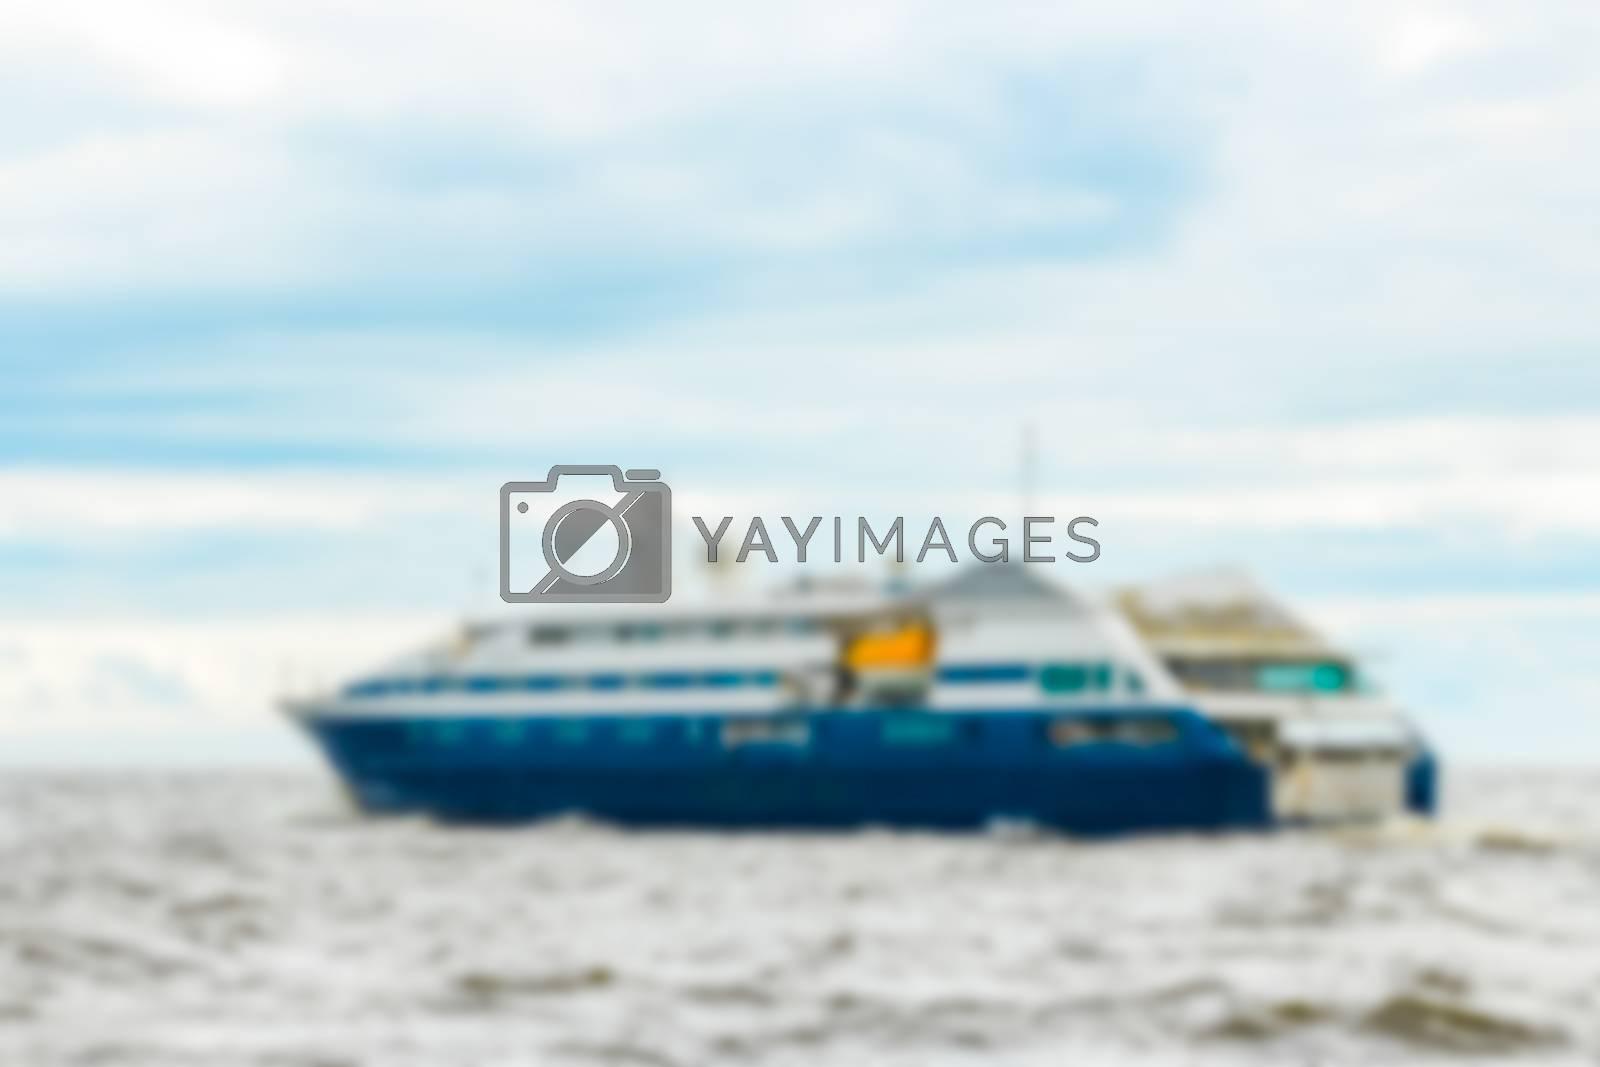 Blue passenger ship - soft lens bokeh image. Defocused background